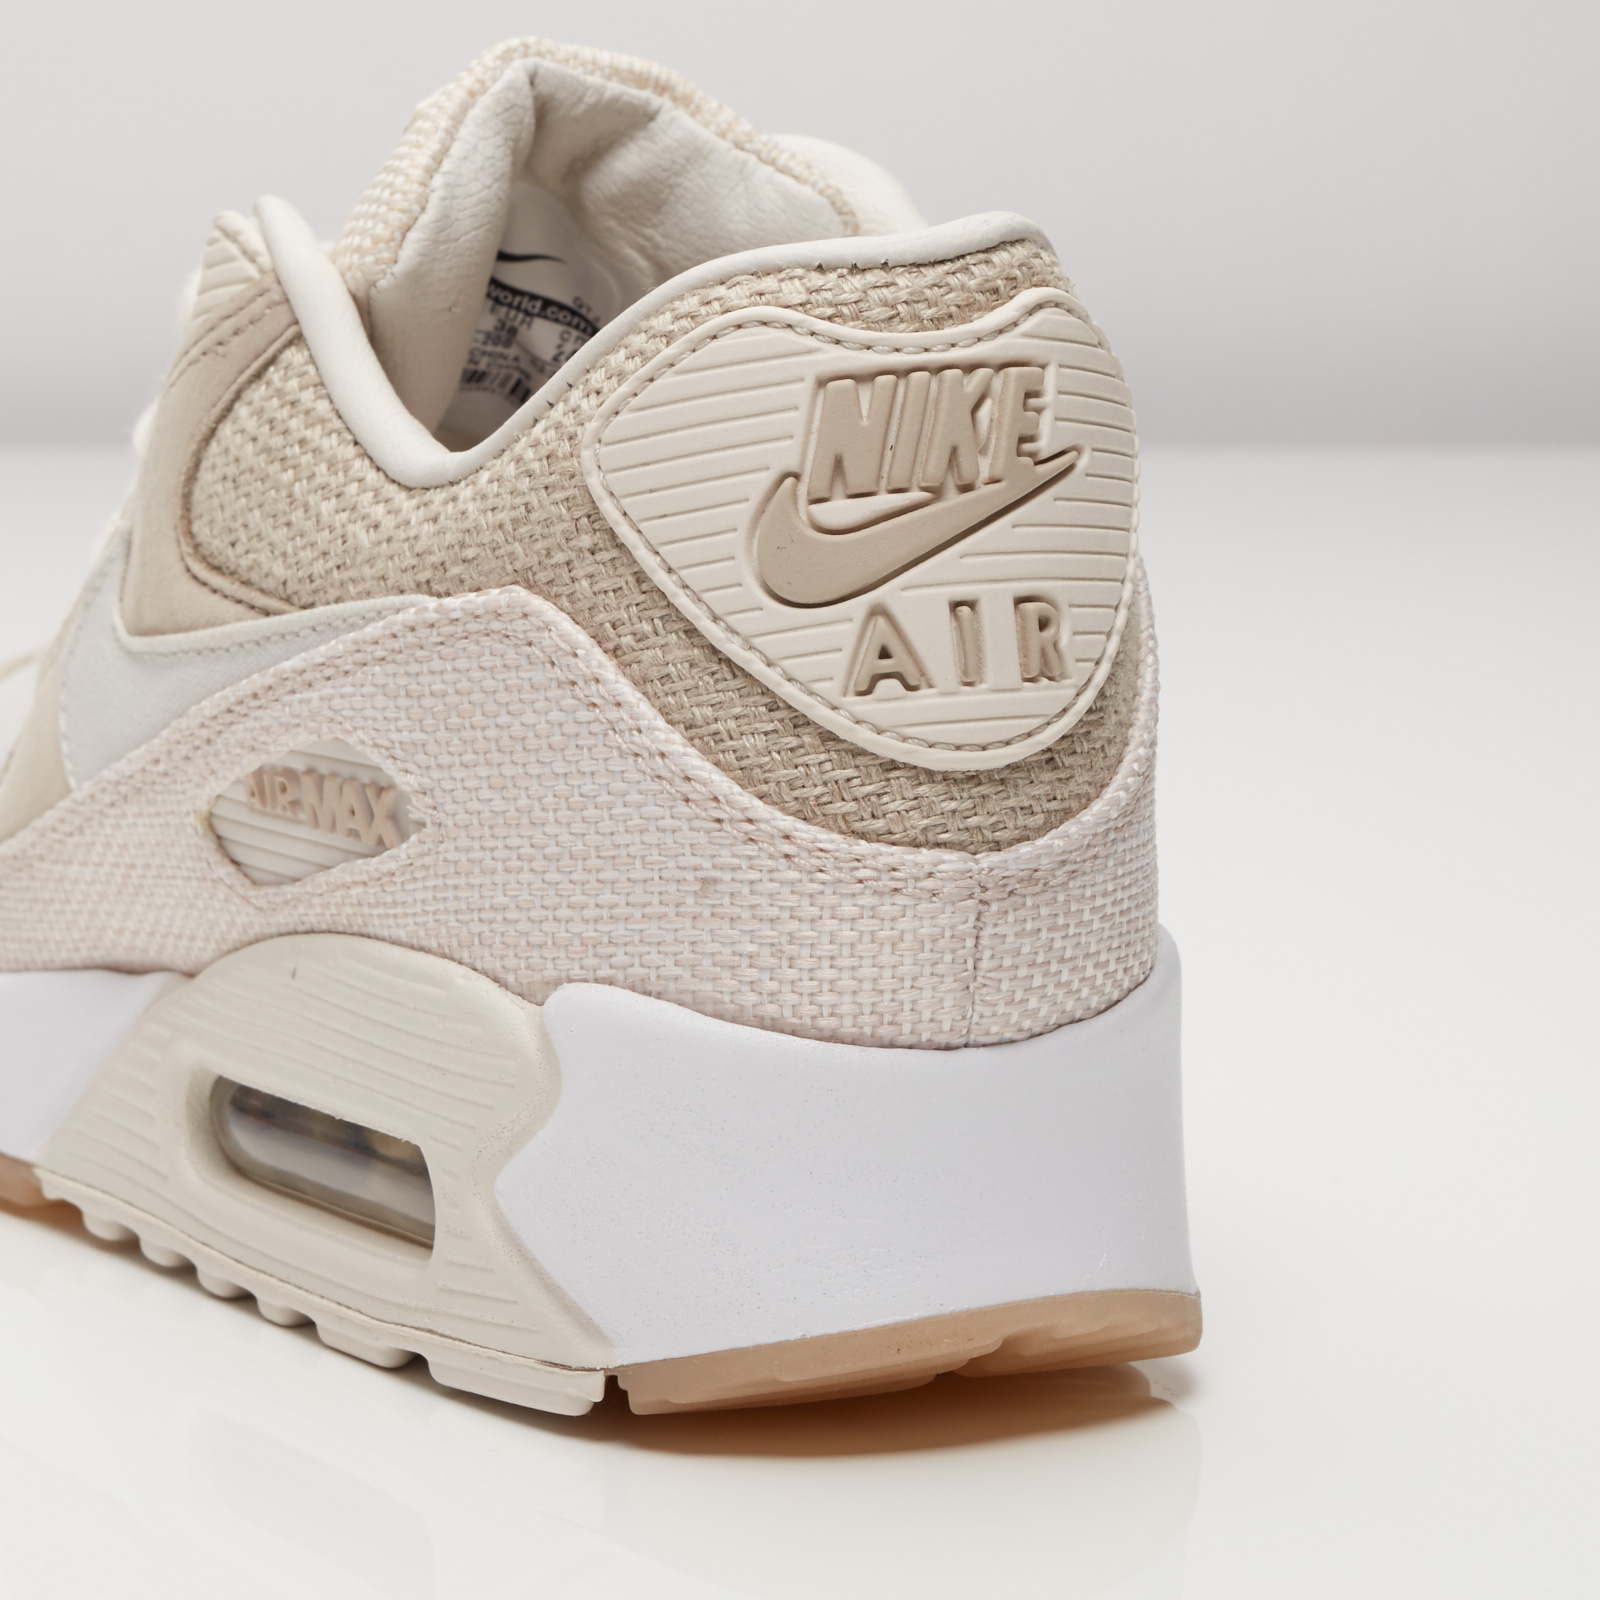 4259df063914b7 Nike Wmns Air Max 90 Pedro Lourenco - 867116-200 - Sneakersnstuff ...